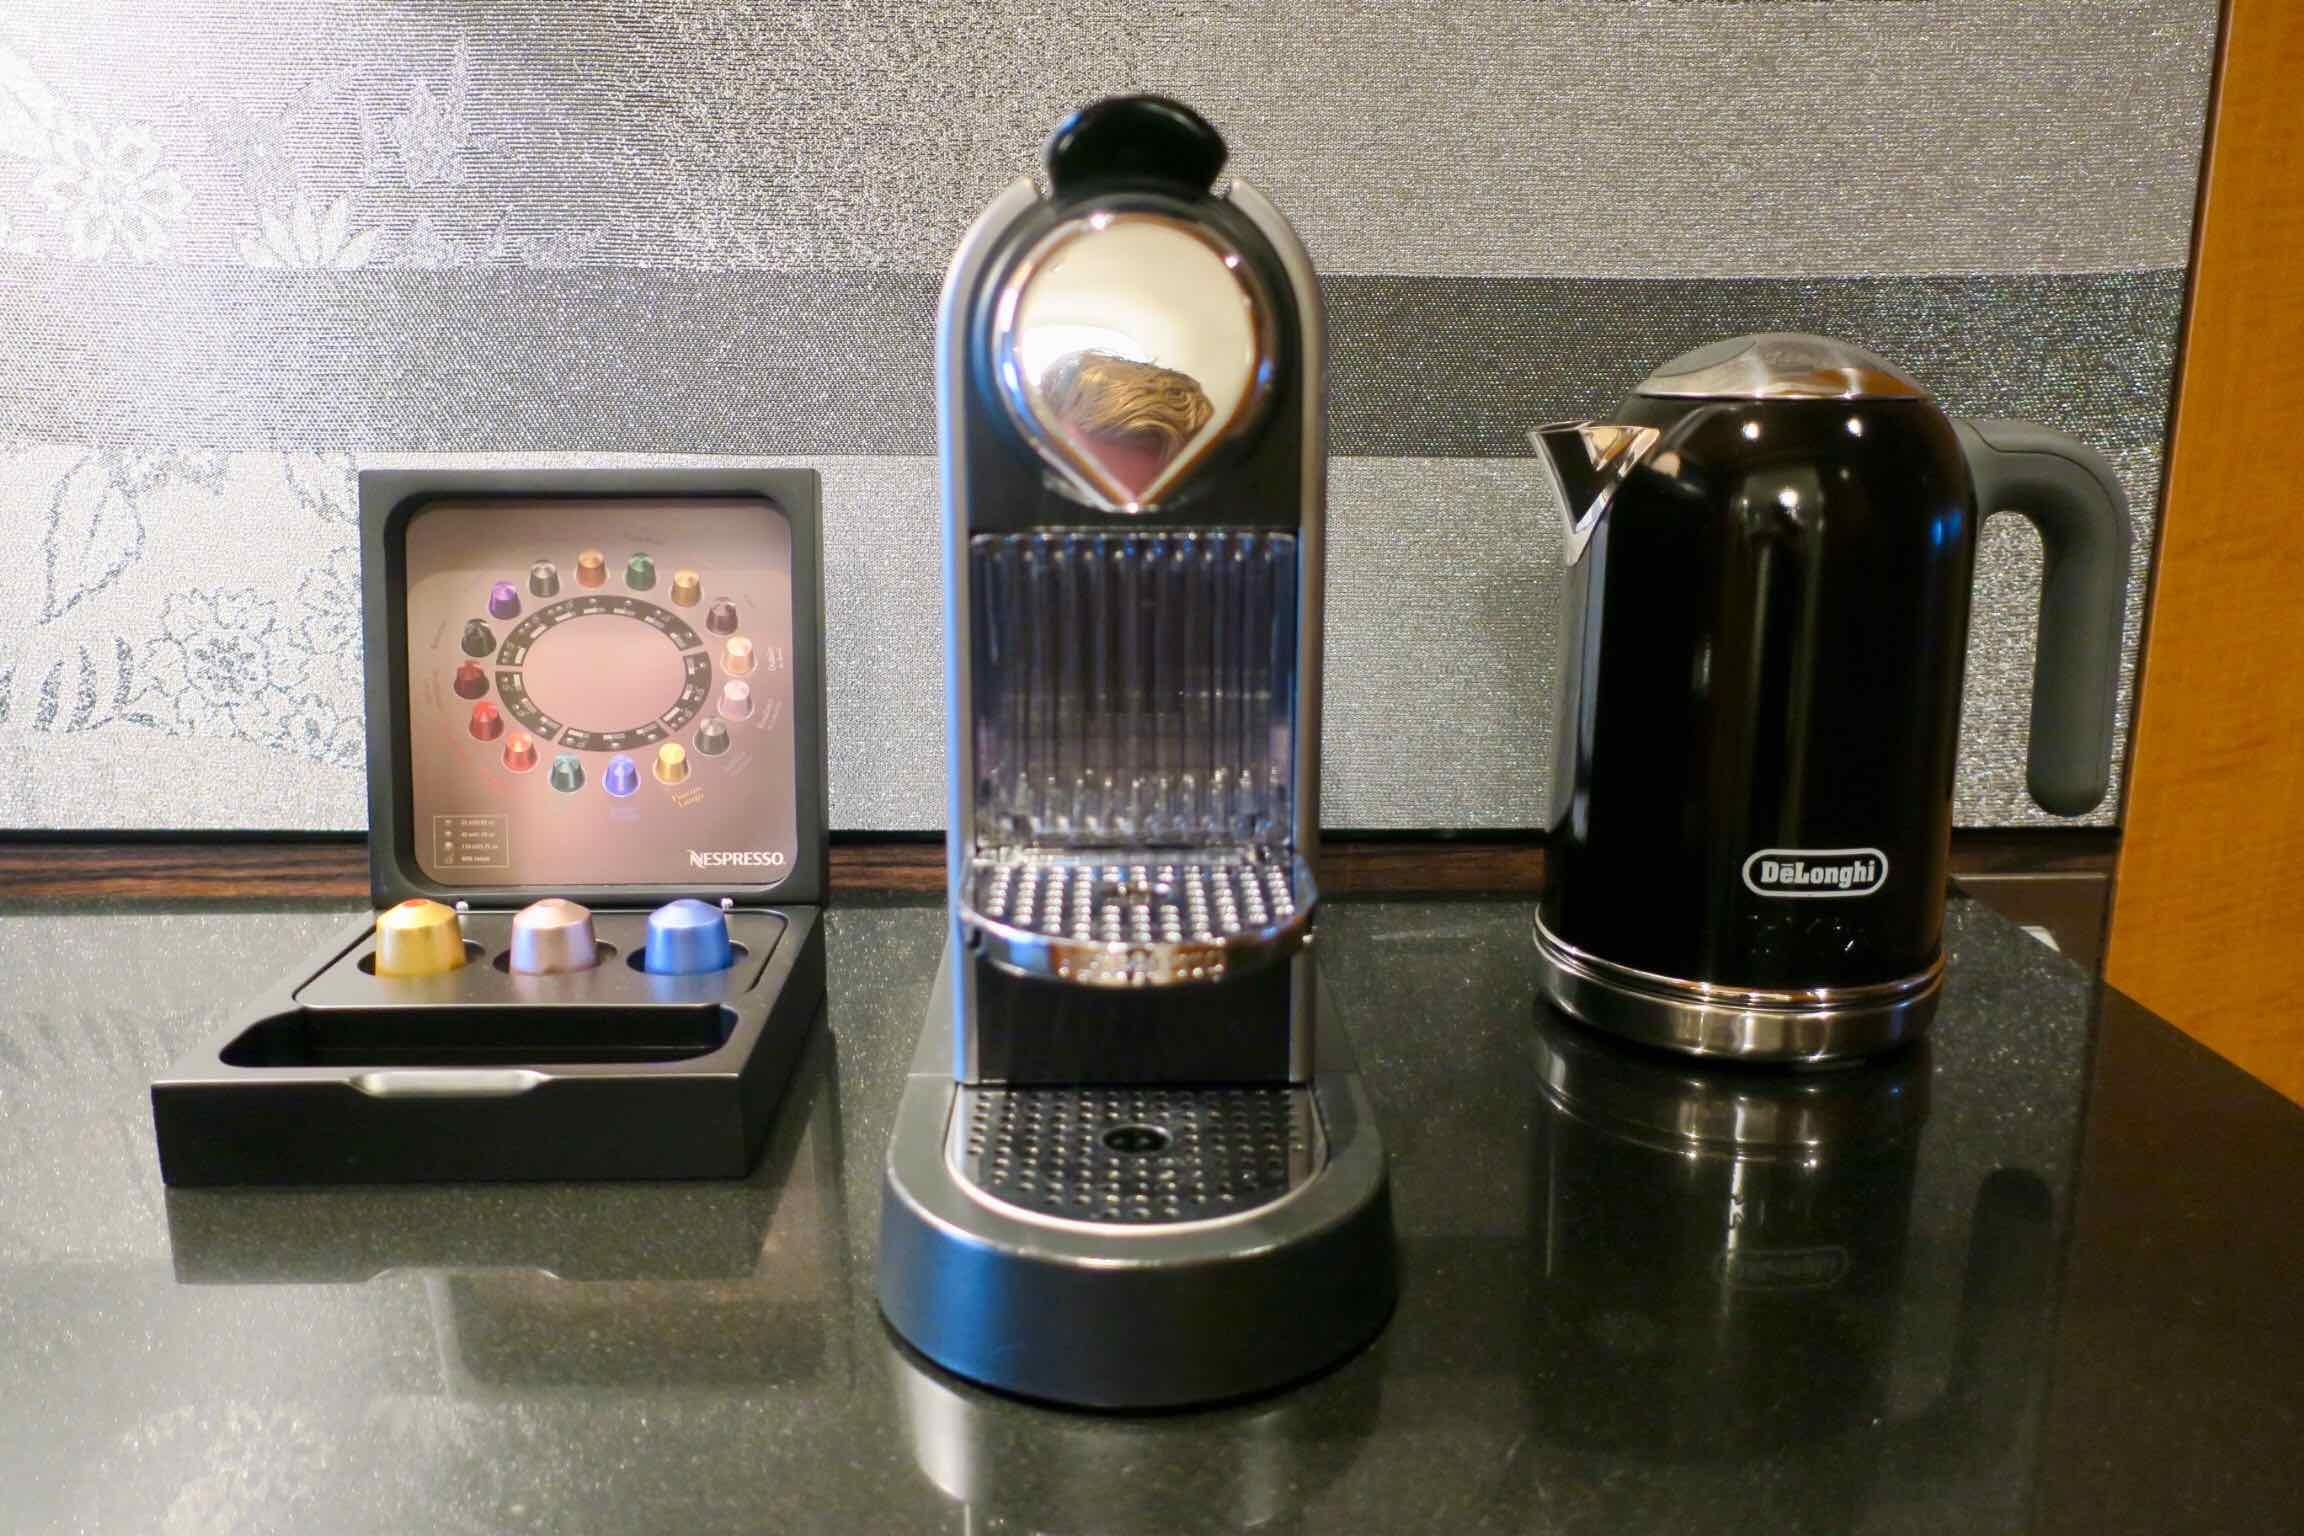 The Ritz-Carlton, Tokyo Nespresso machine